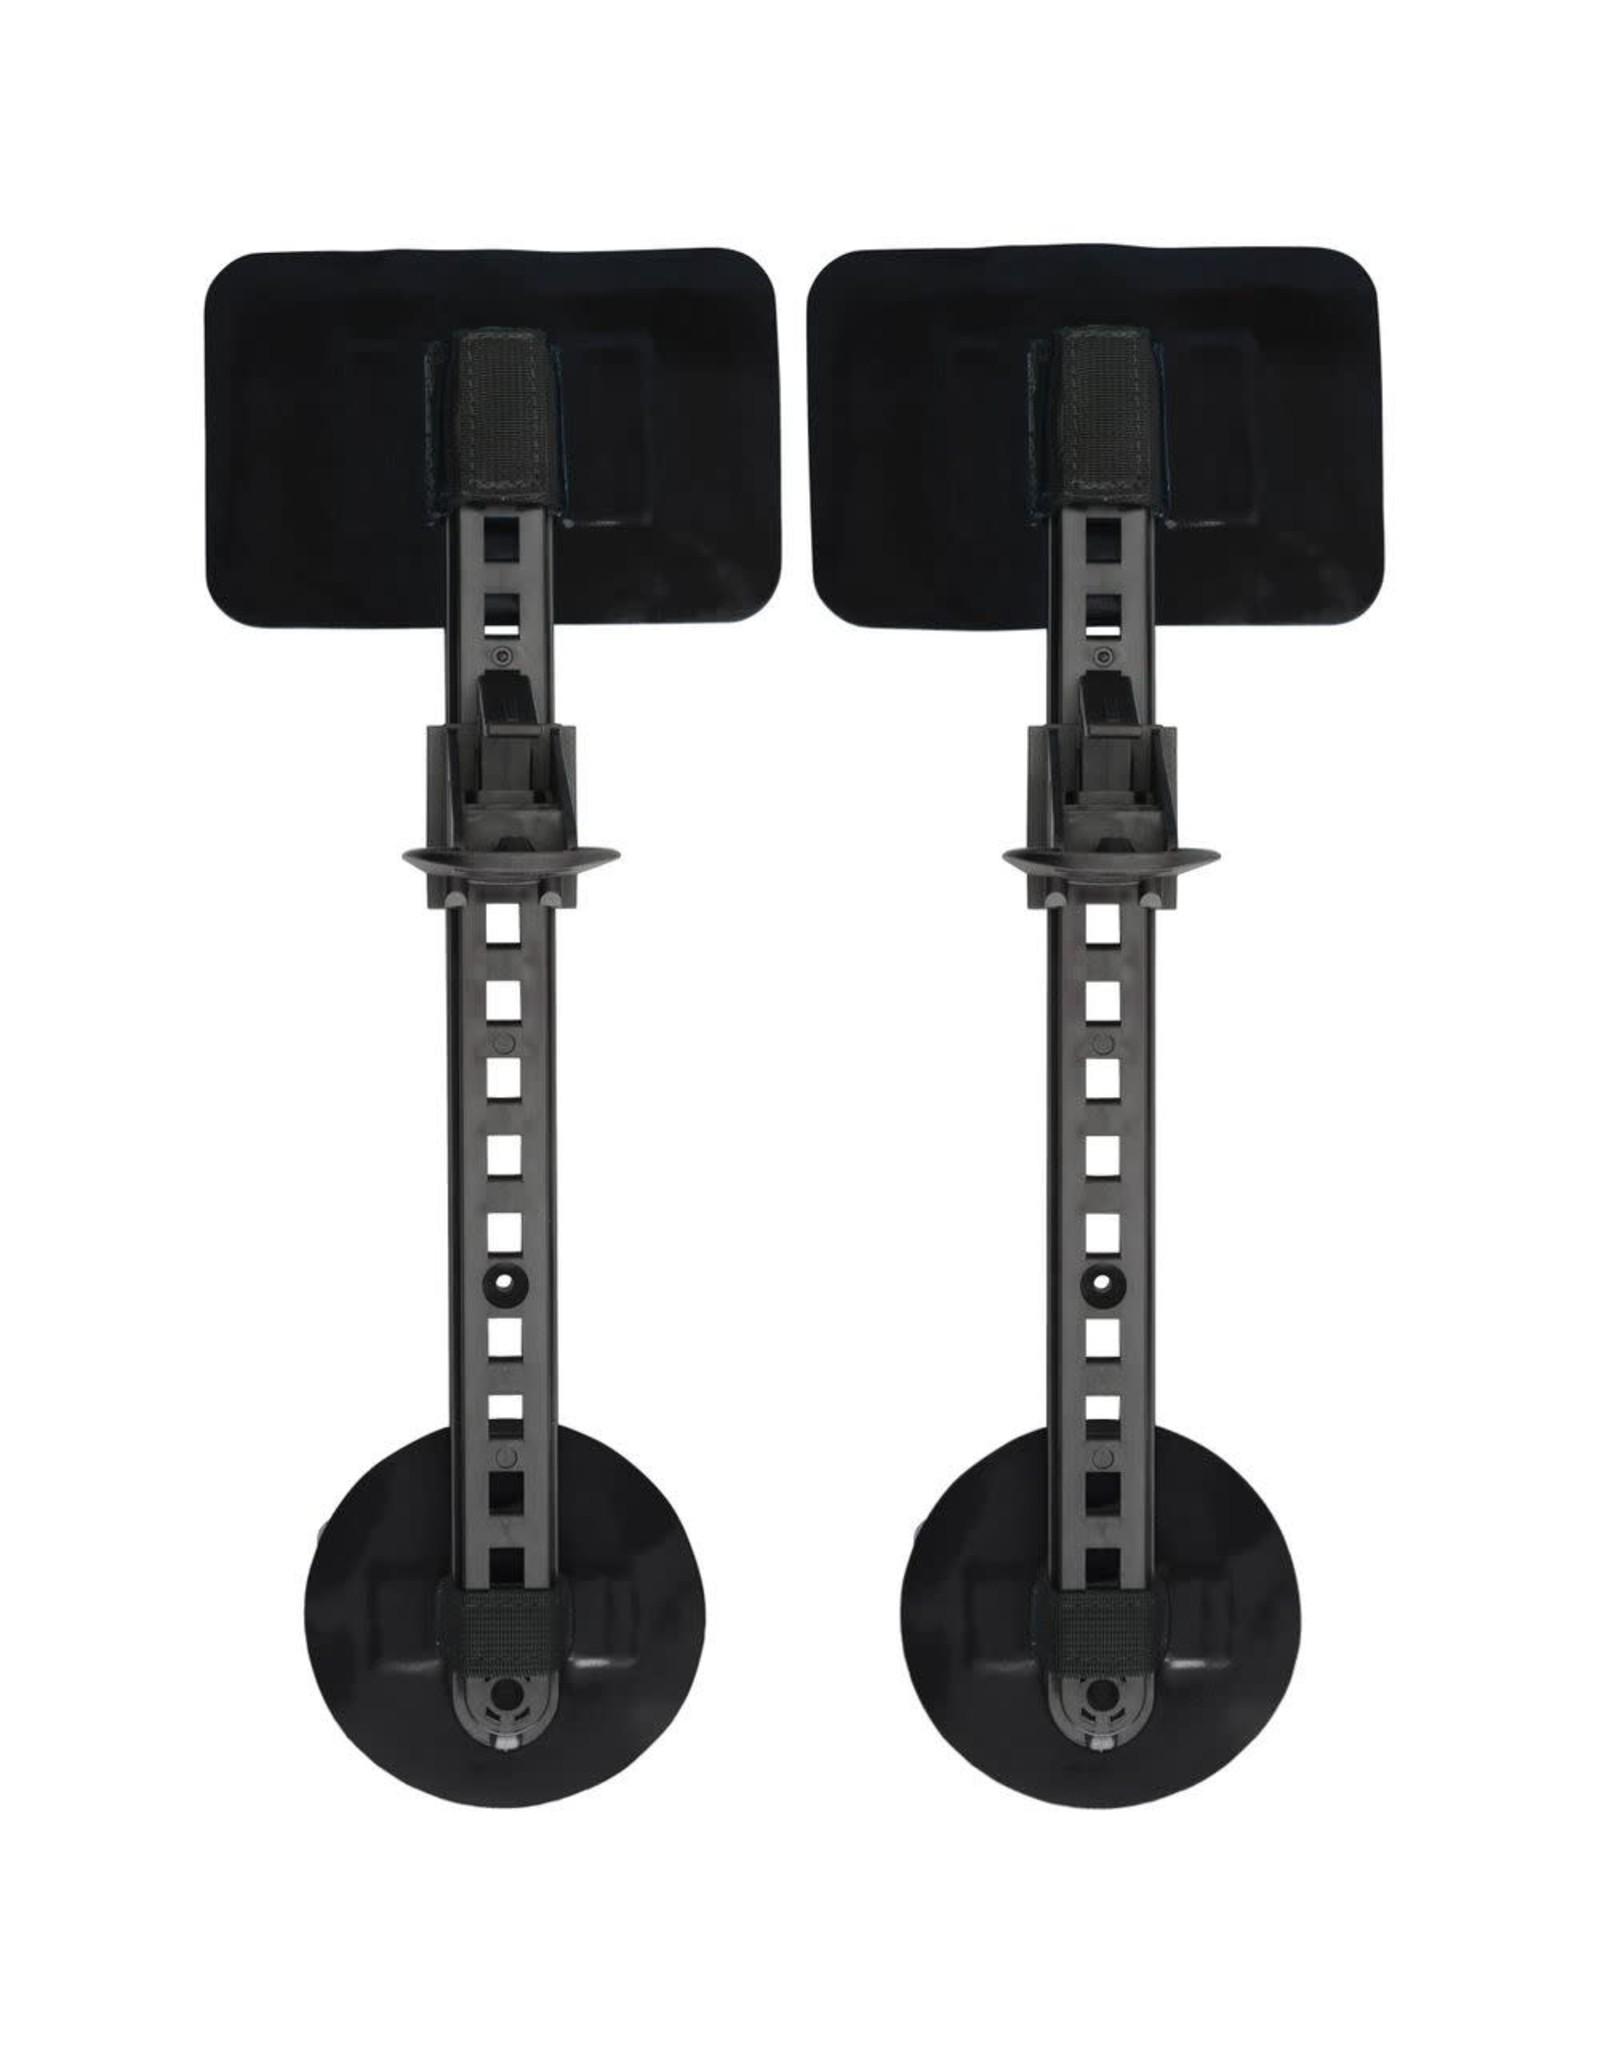 NRS NRS Cale pied - PVC Kayak Foot Braces